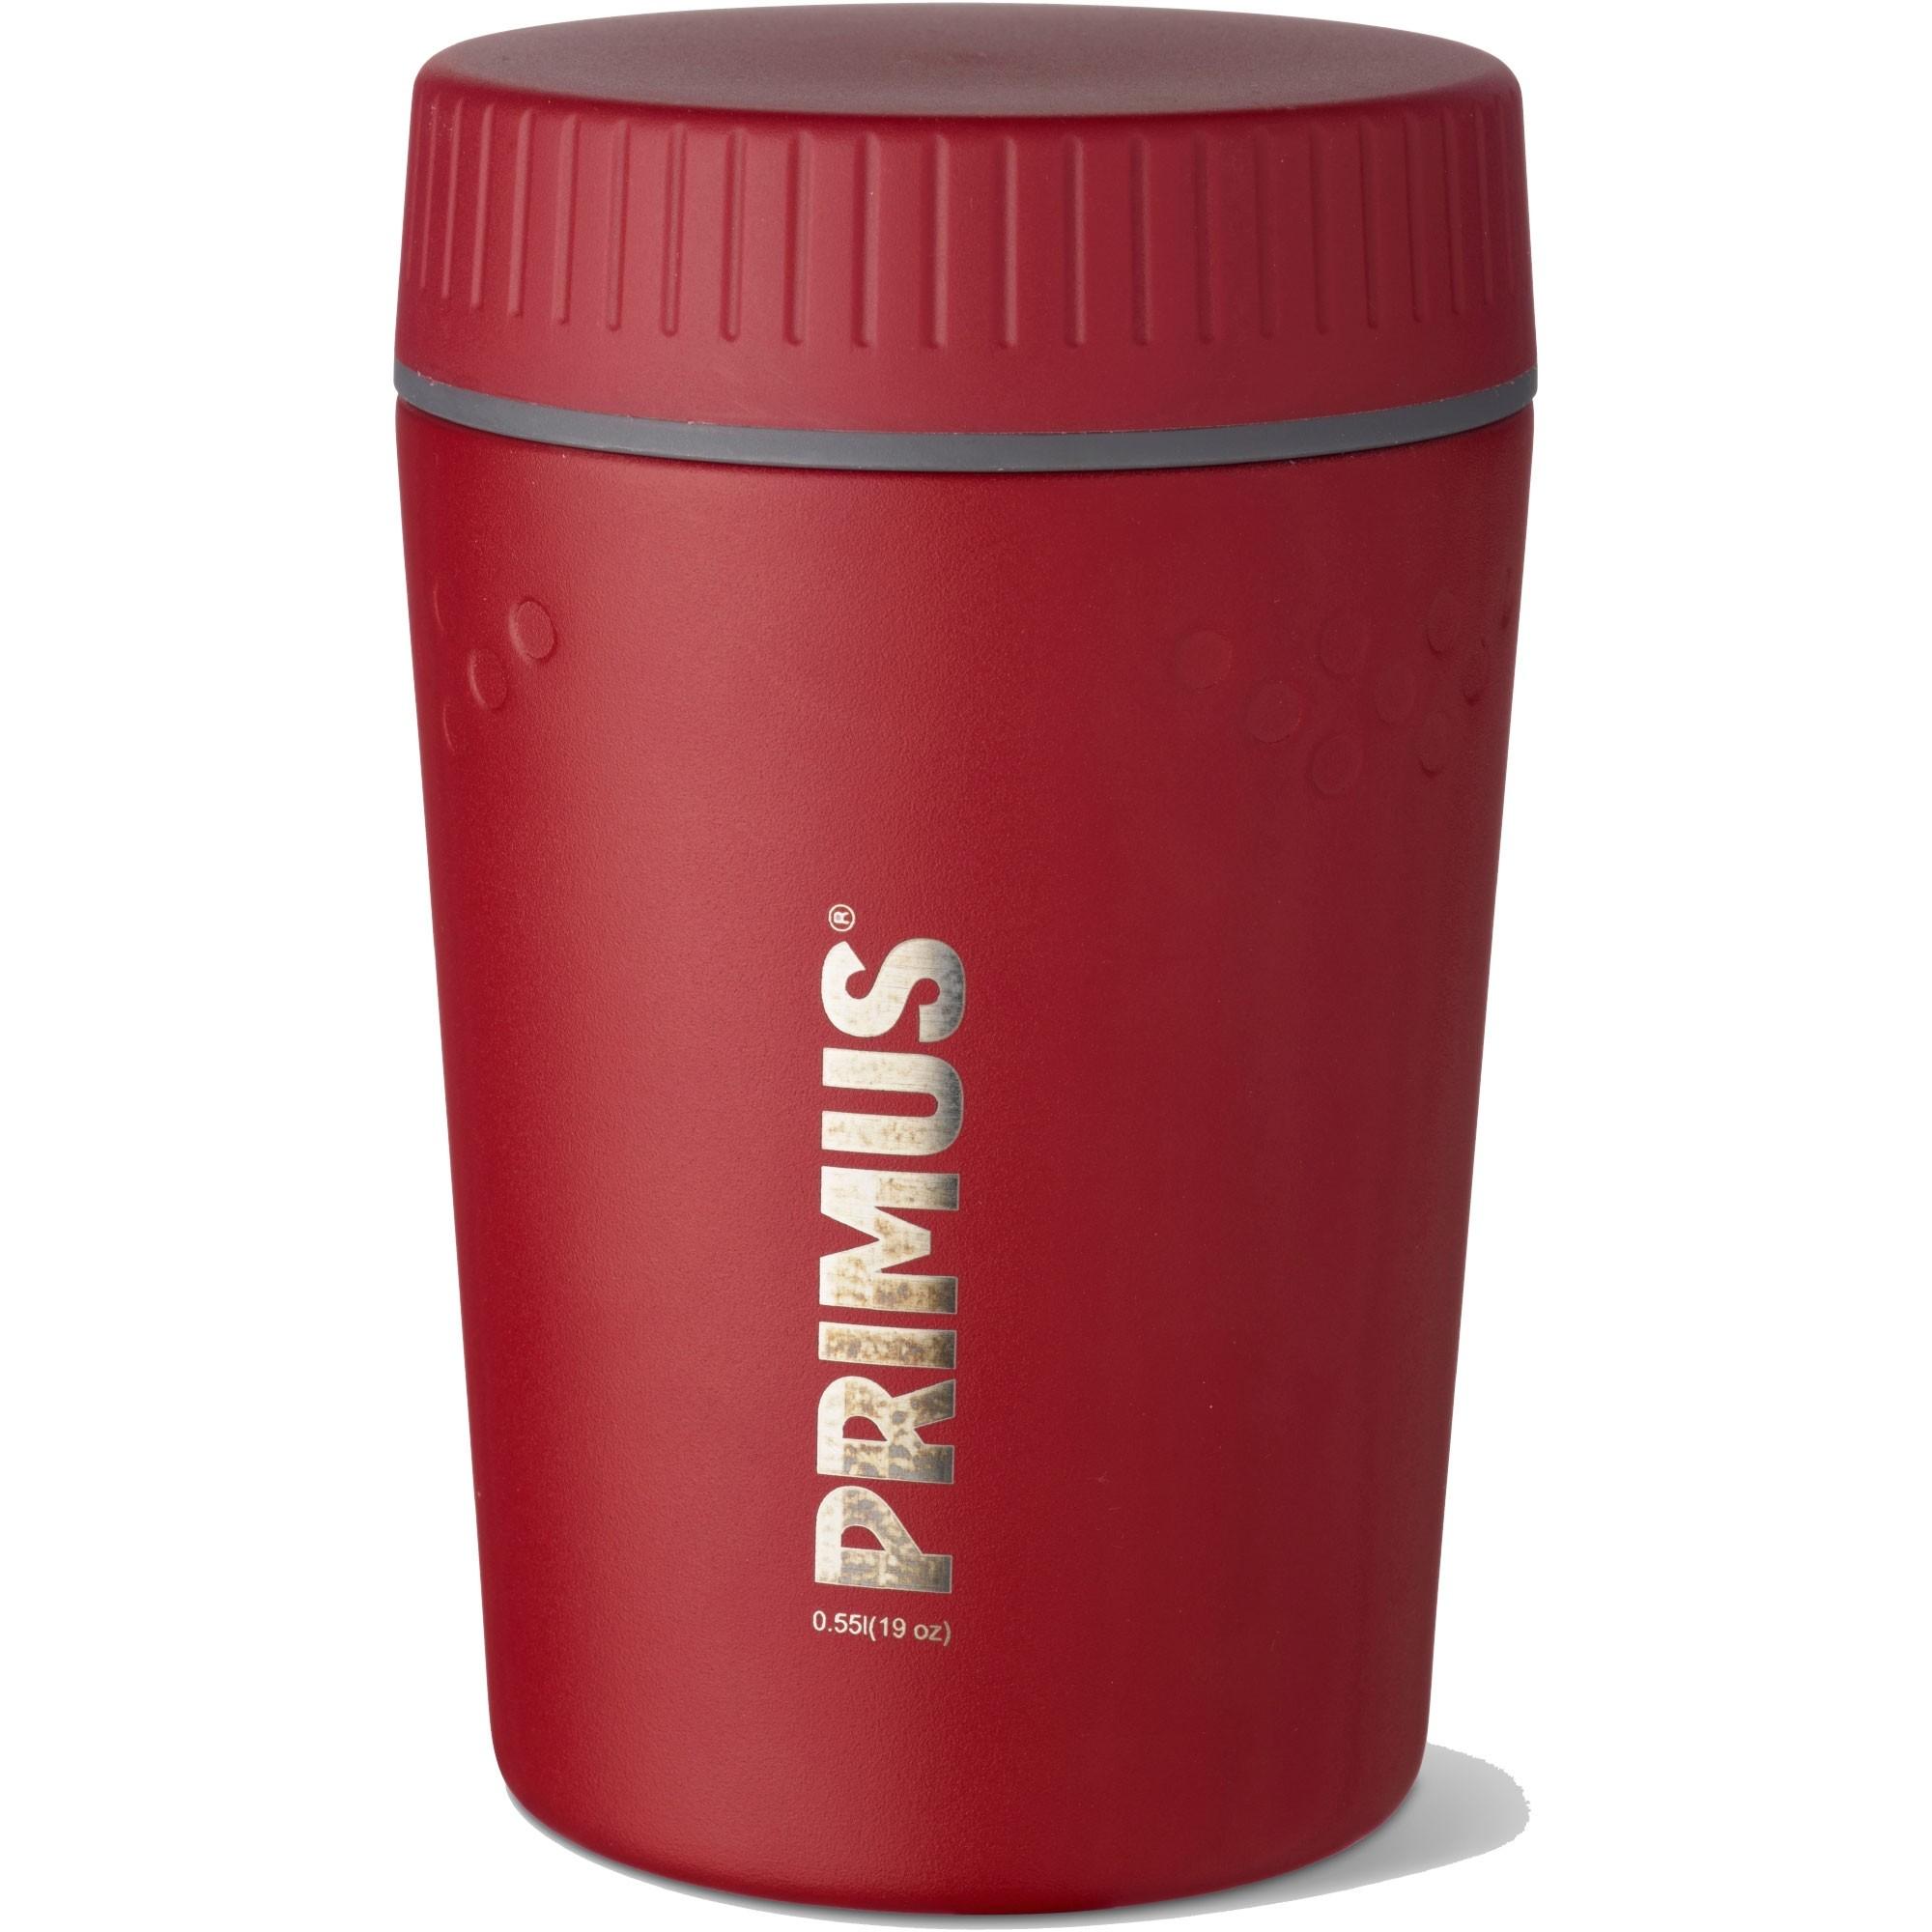 Primus Trailbreak Lunch Jug - Red